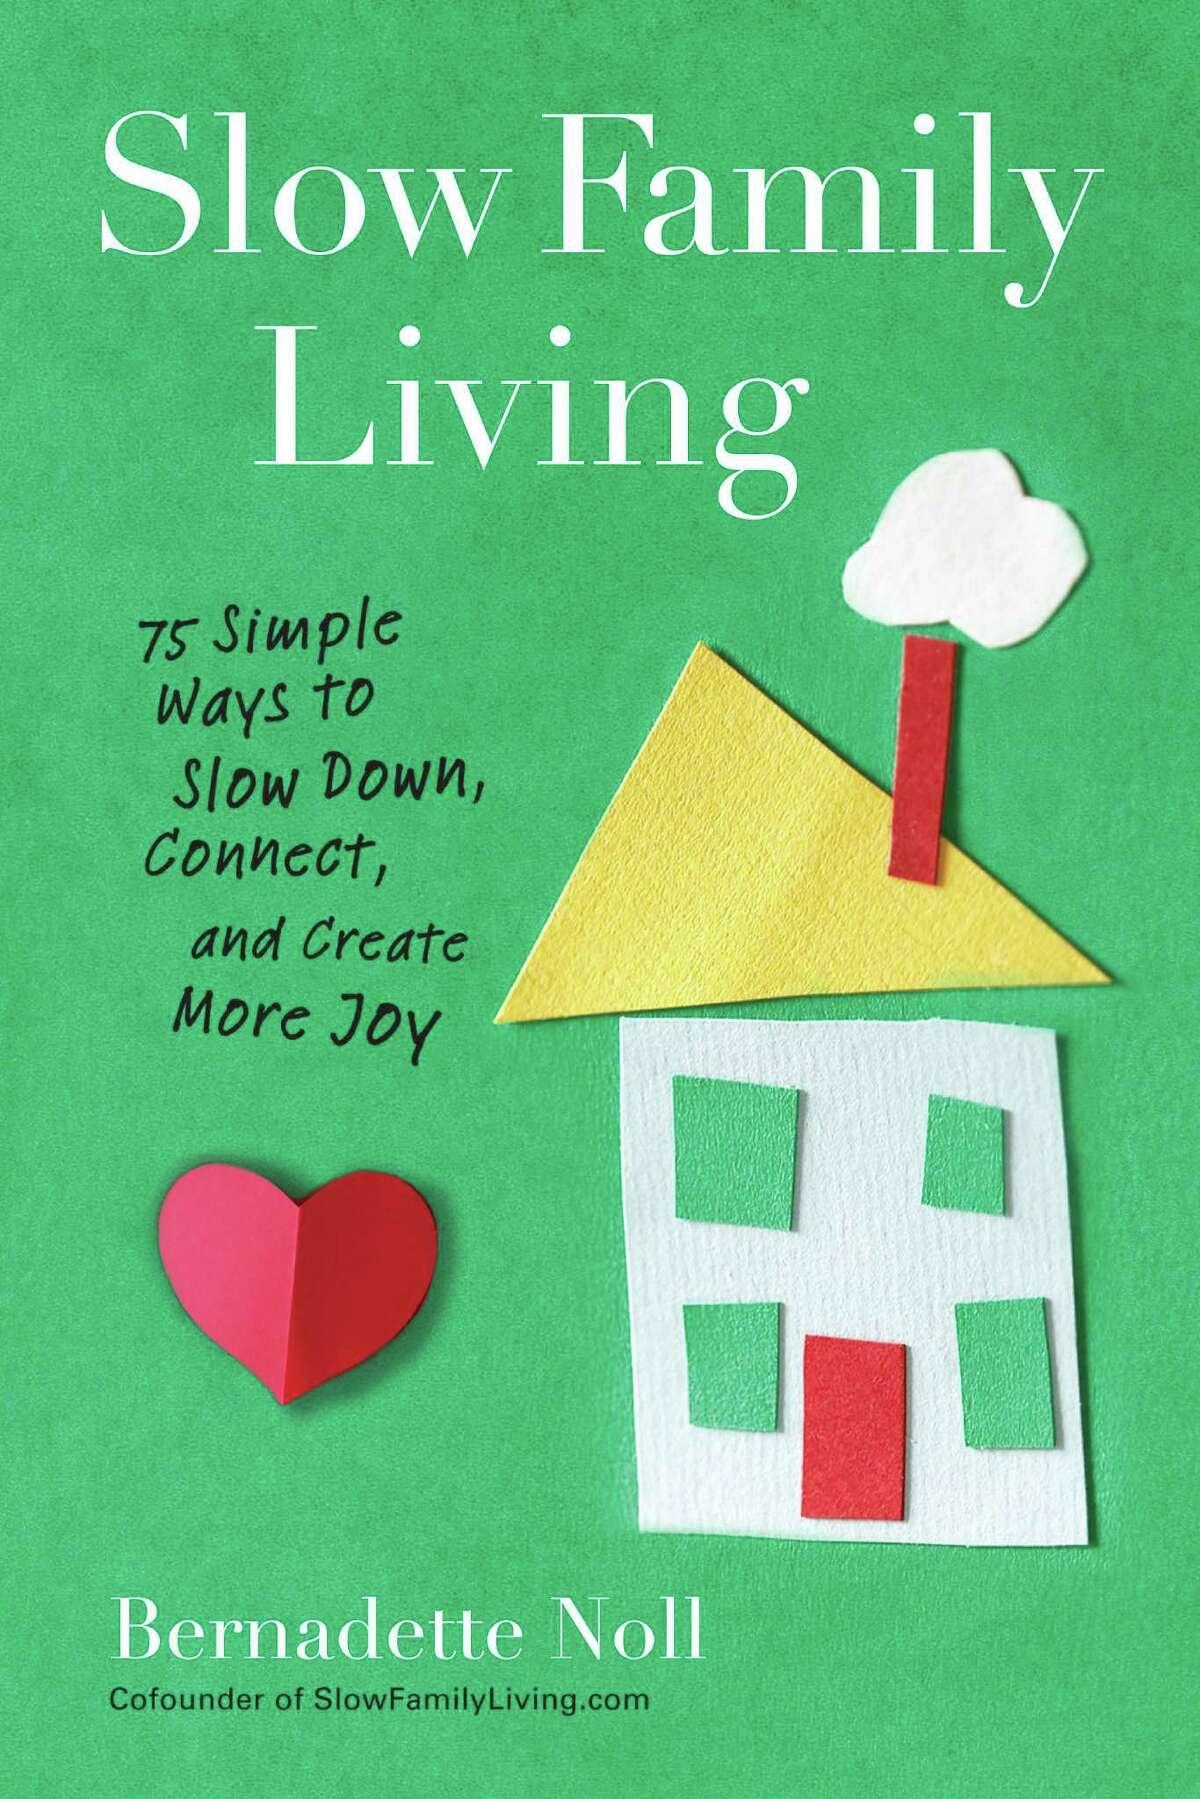 Austin author Bernadette Noll drew on personal experiences for